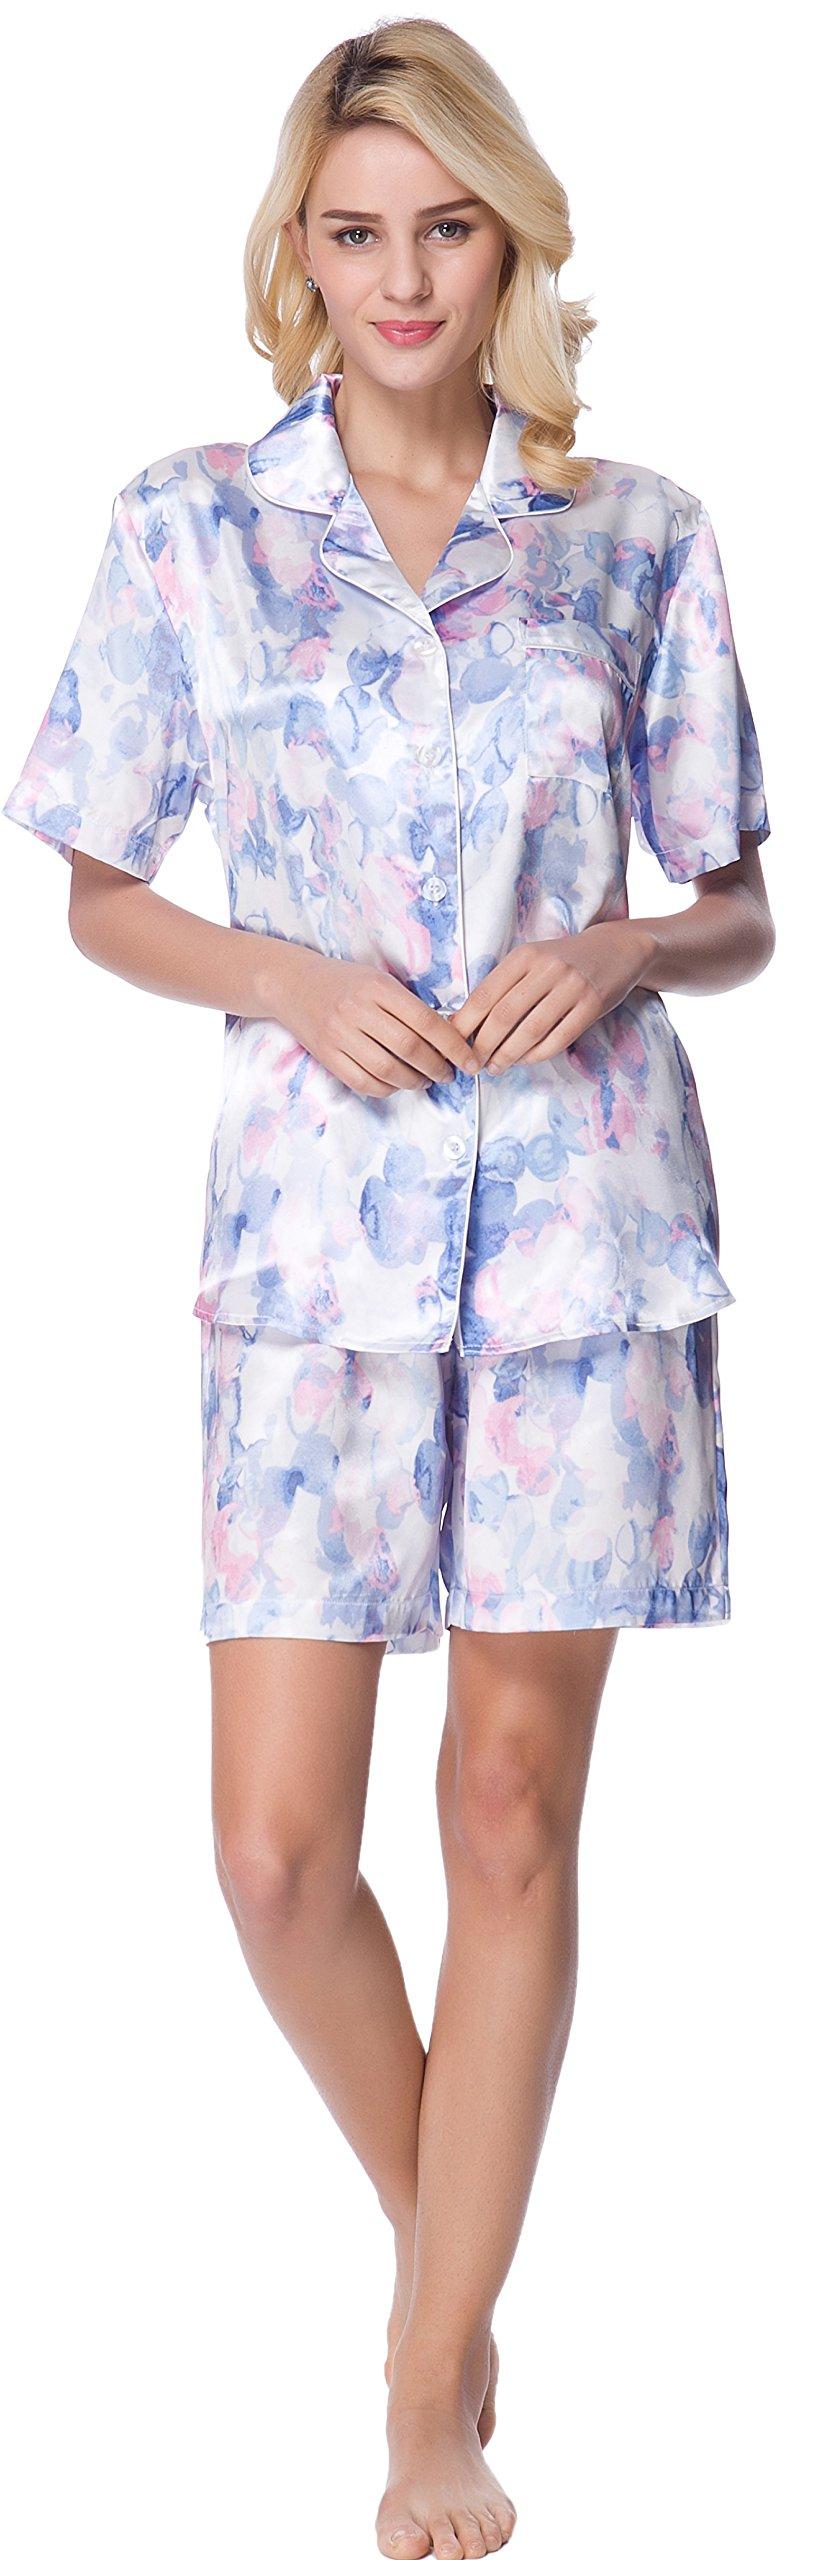 Women's Short Sleeve Classical Silky Satin Pajamas, Short Bottom Down Woven PJ Set (Small, Blue Floral Print)